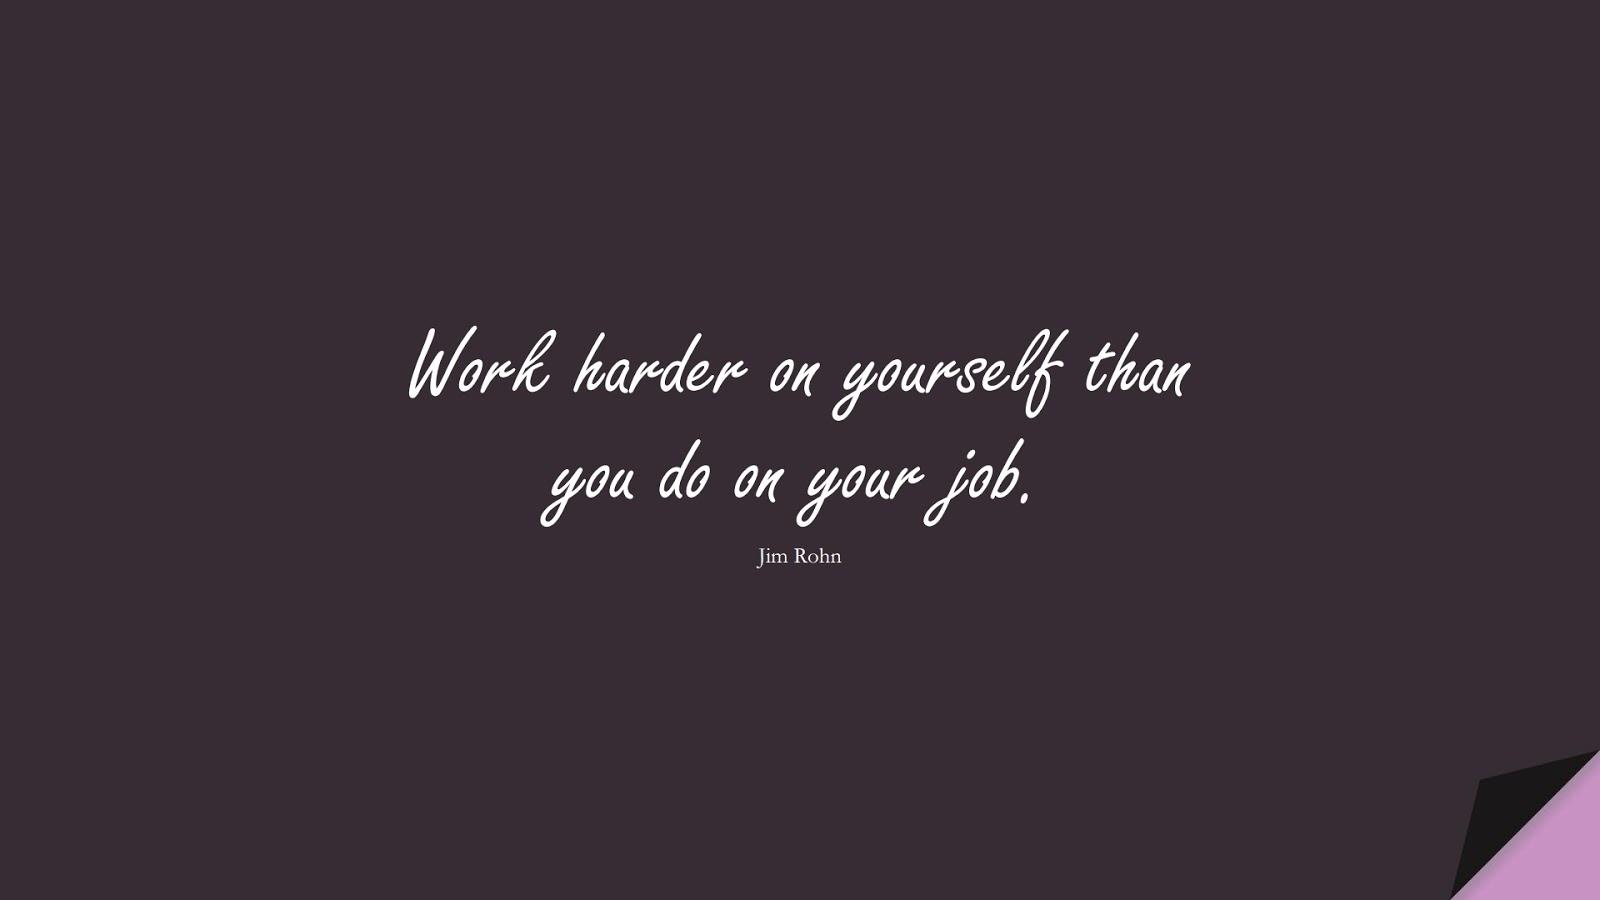 Work harder on yourself than you do on your job. (Jim Rohn);  #HardWorkQuotes